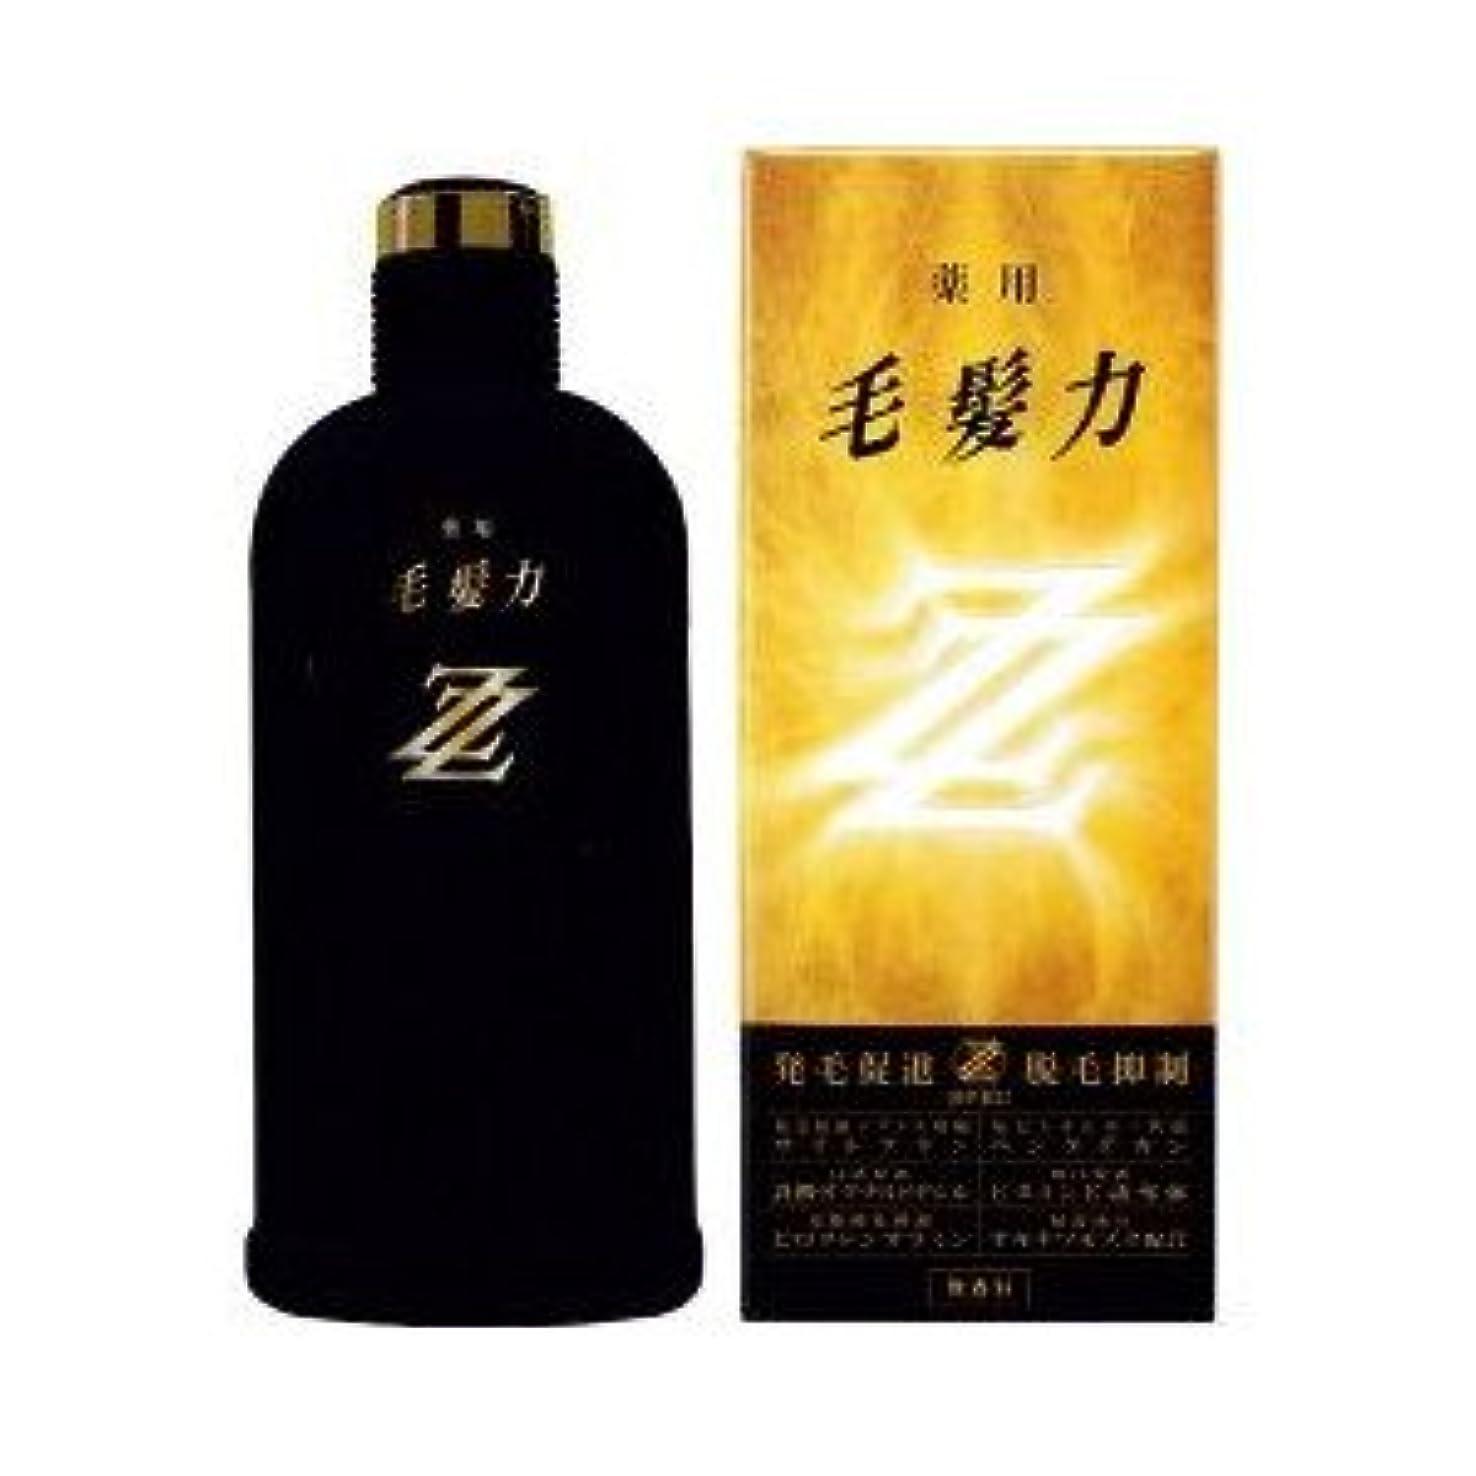 付属品誠実ペニーライオン 薬用毛髪力ZZ 無香料 200ML